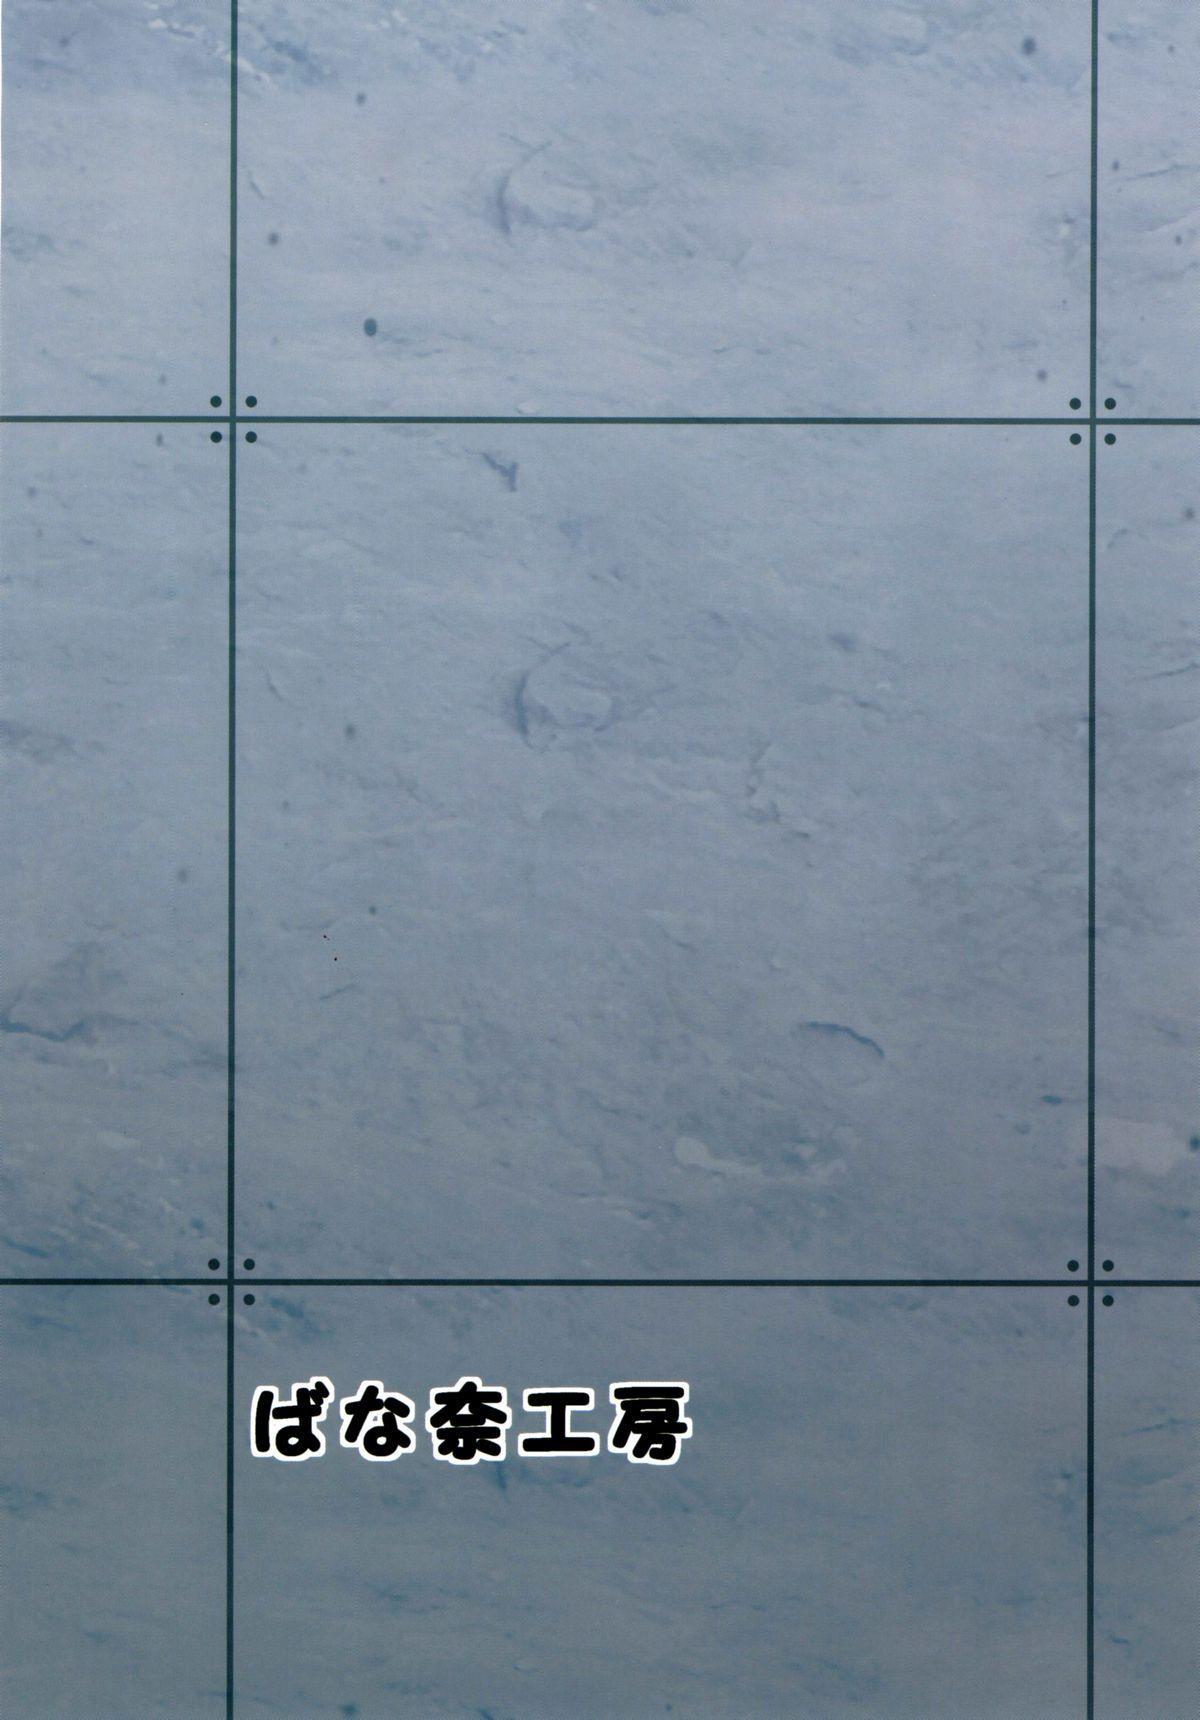 Akitsu Maru wa Ketsuana Gurui Onee-chan   秋津丸是屁眼狂乱姐姐 24